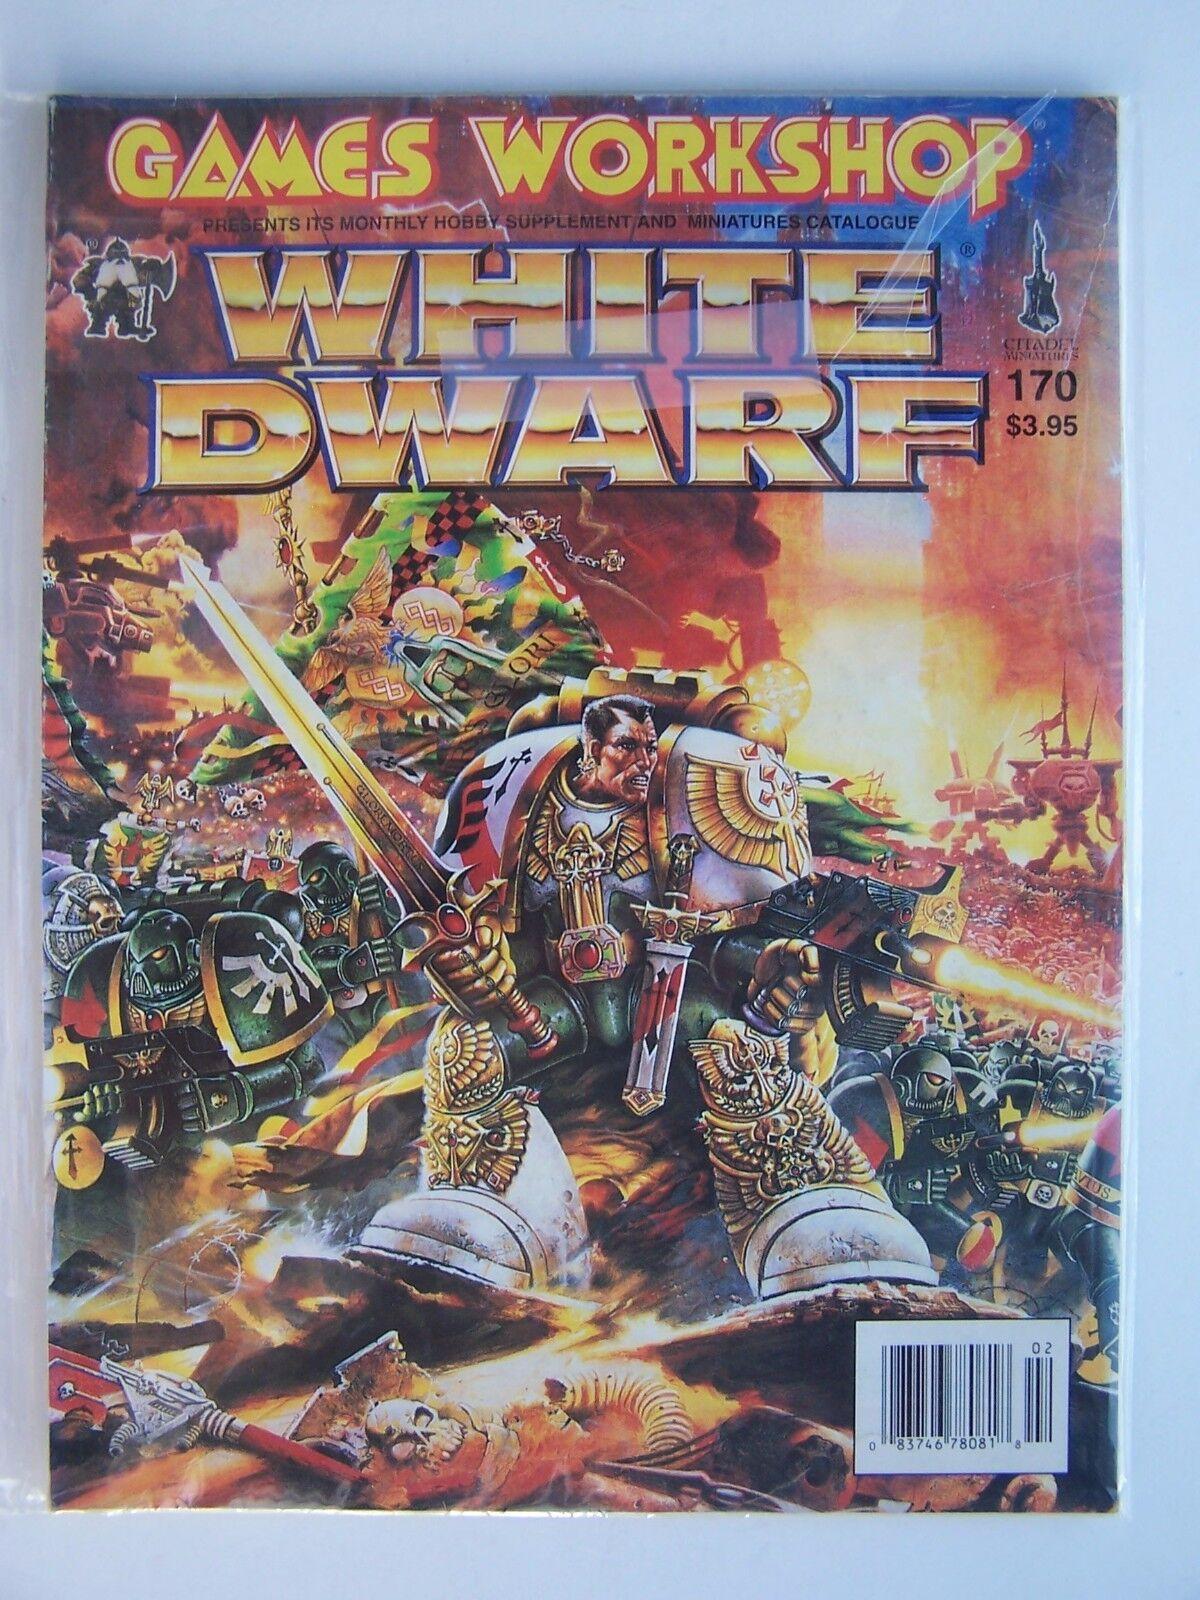 White Dwarf #170 February 1994 Paperback Magazine